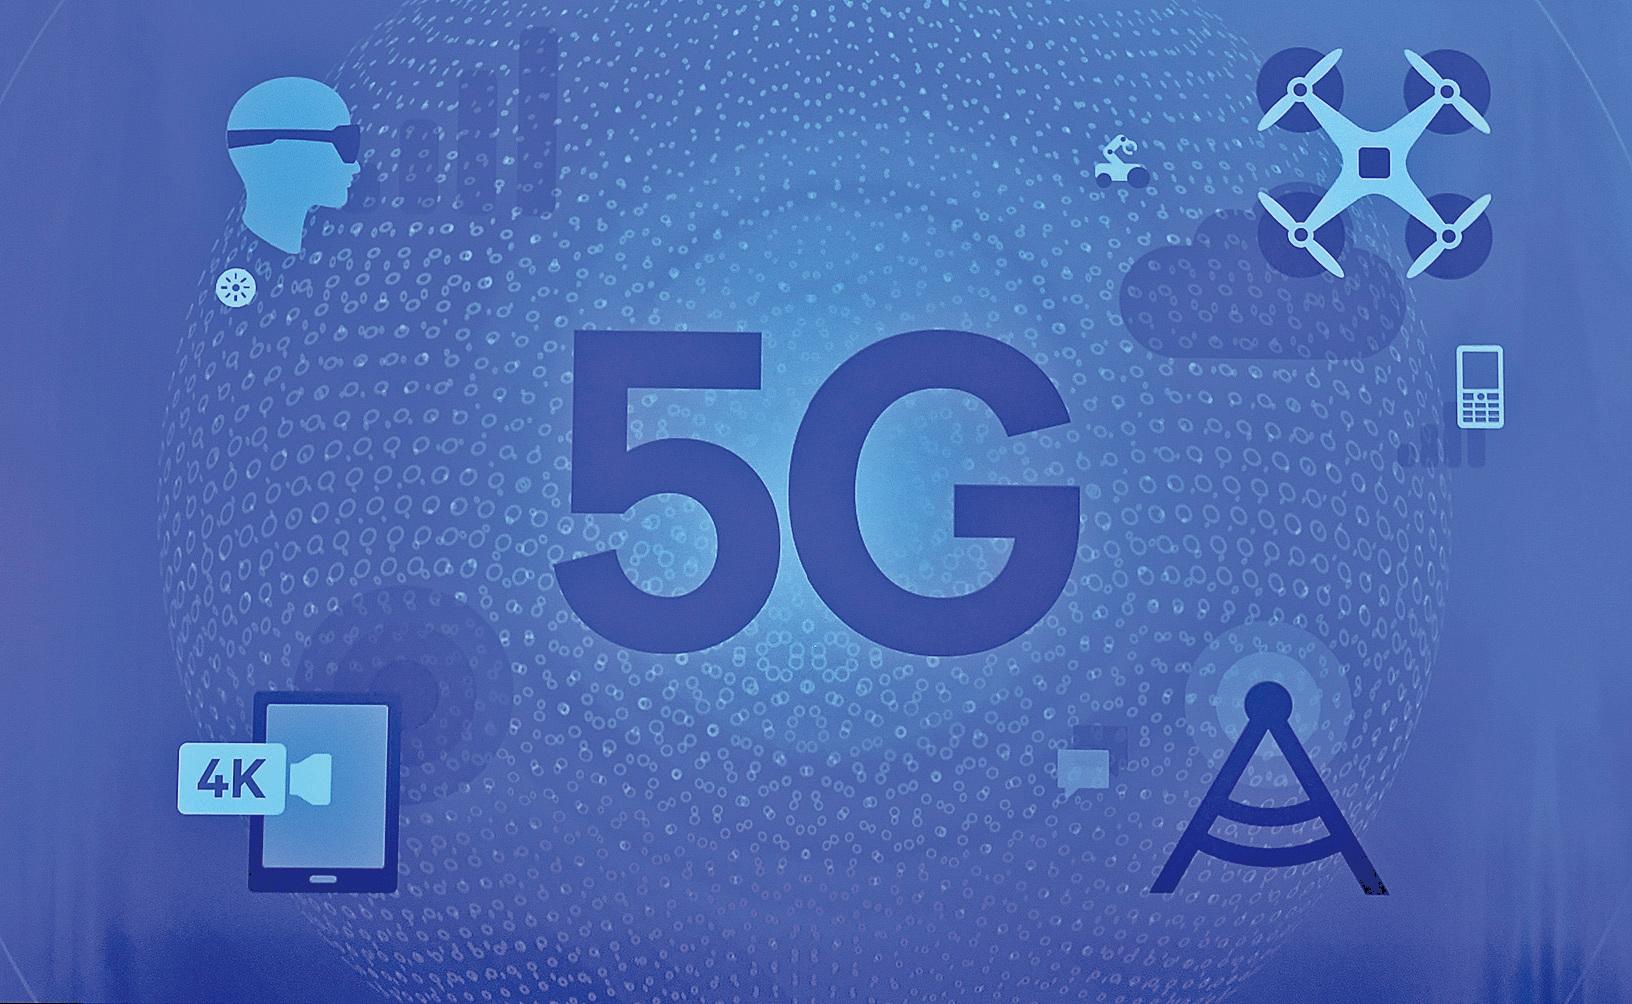 5G的速度將比4G快約10倍,將比之前預想的2020年提早一年實現。(Getty Images)